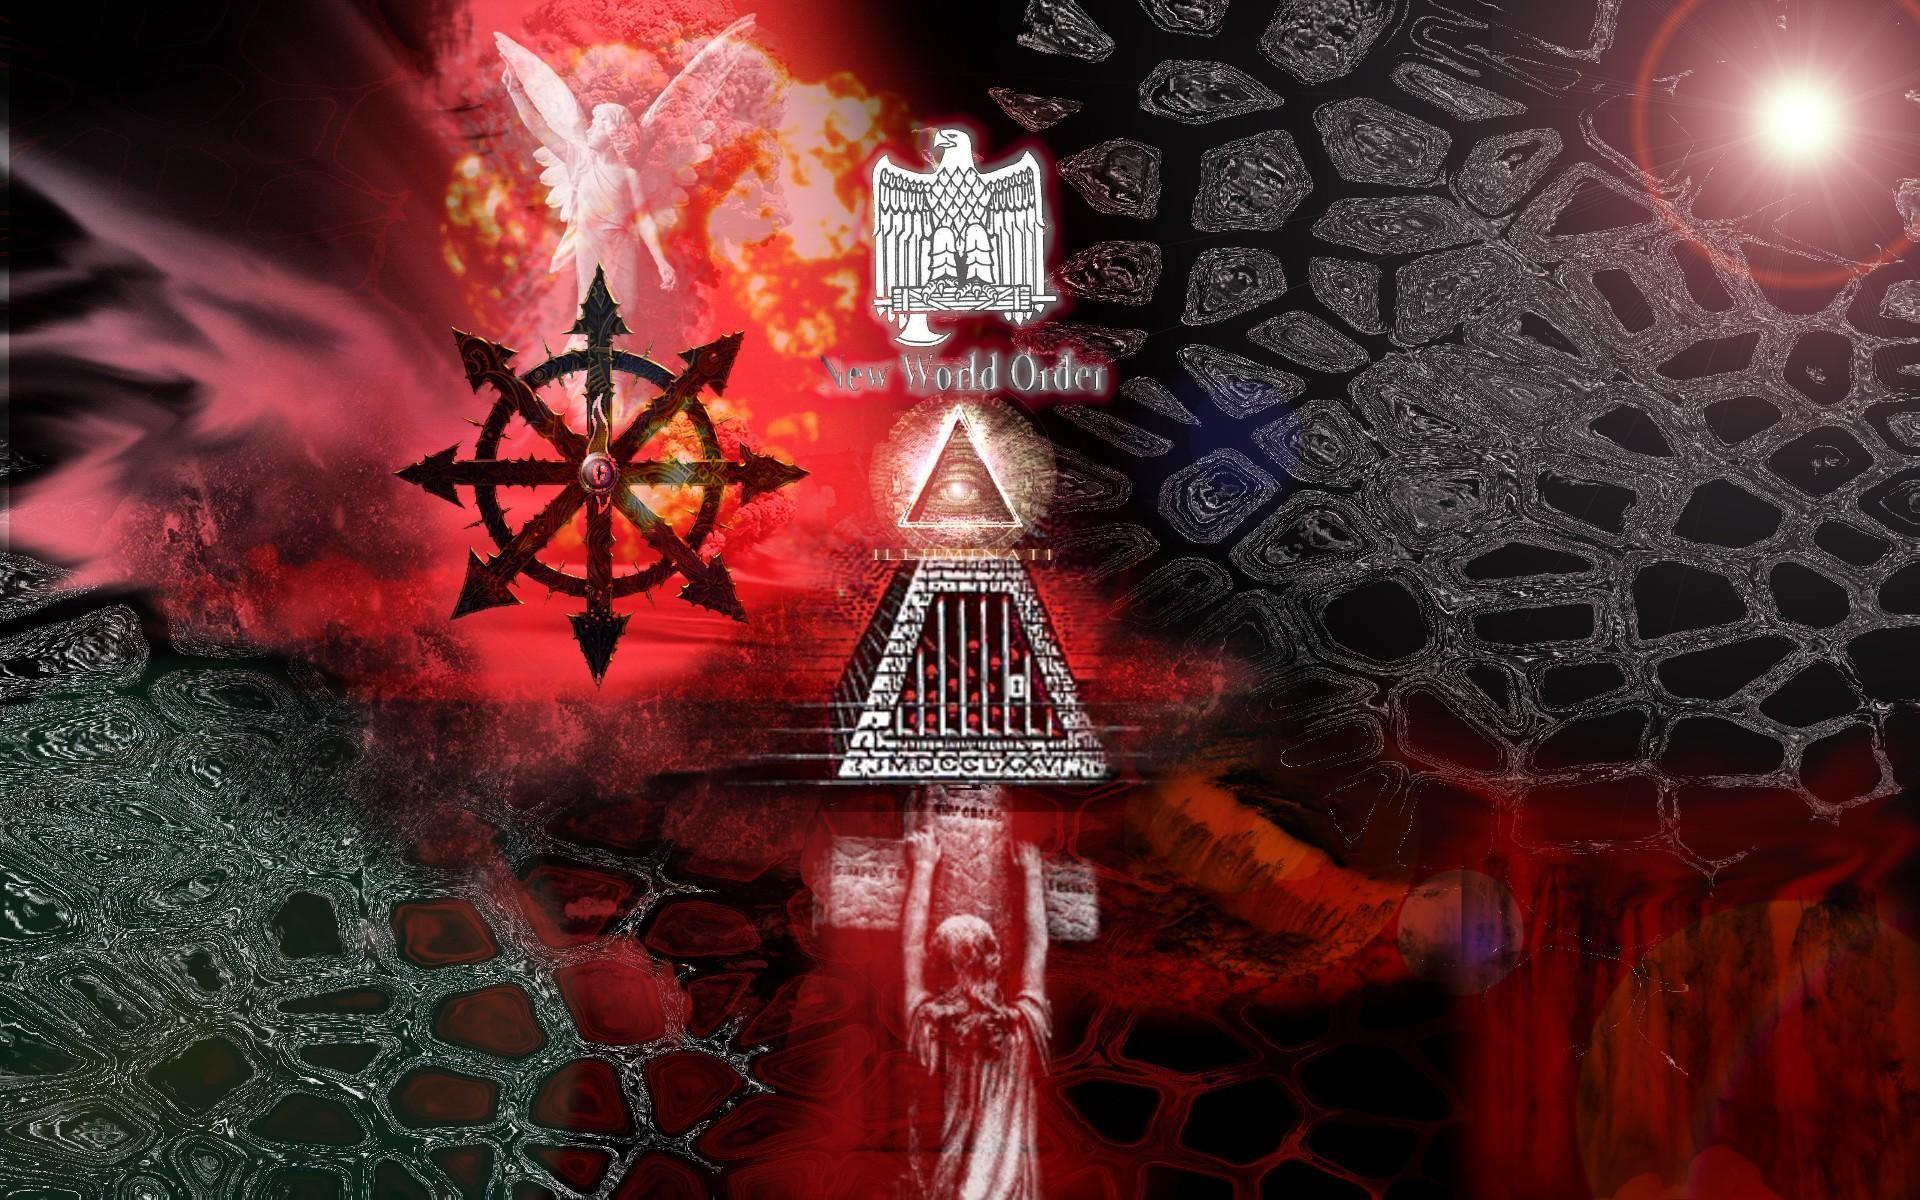 Illuminati Swag Wallpapers High Resolution On Wallpaper Hd 1920 x 1200 px  692.31 KB iphone dope